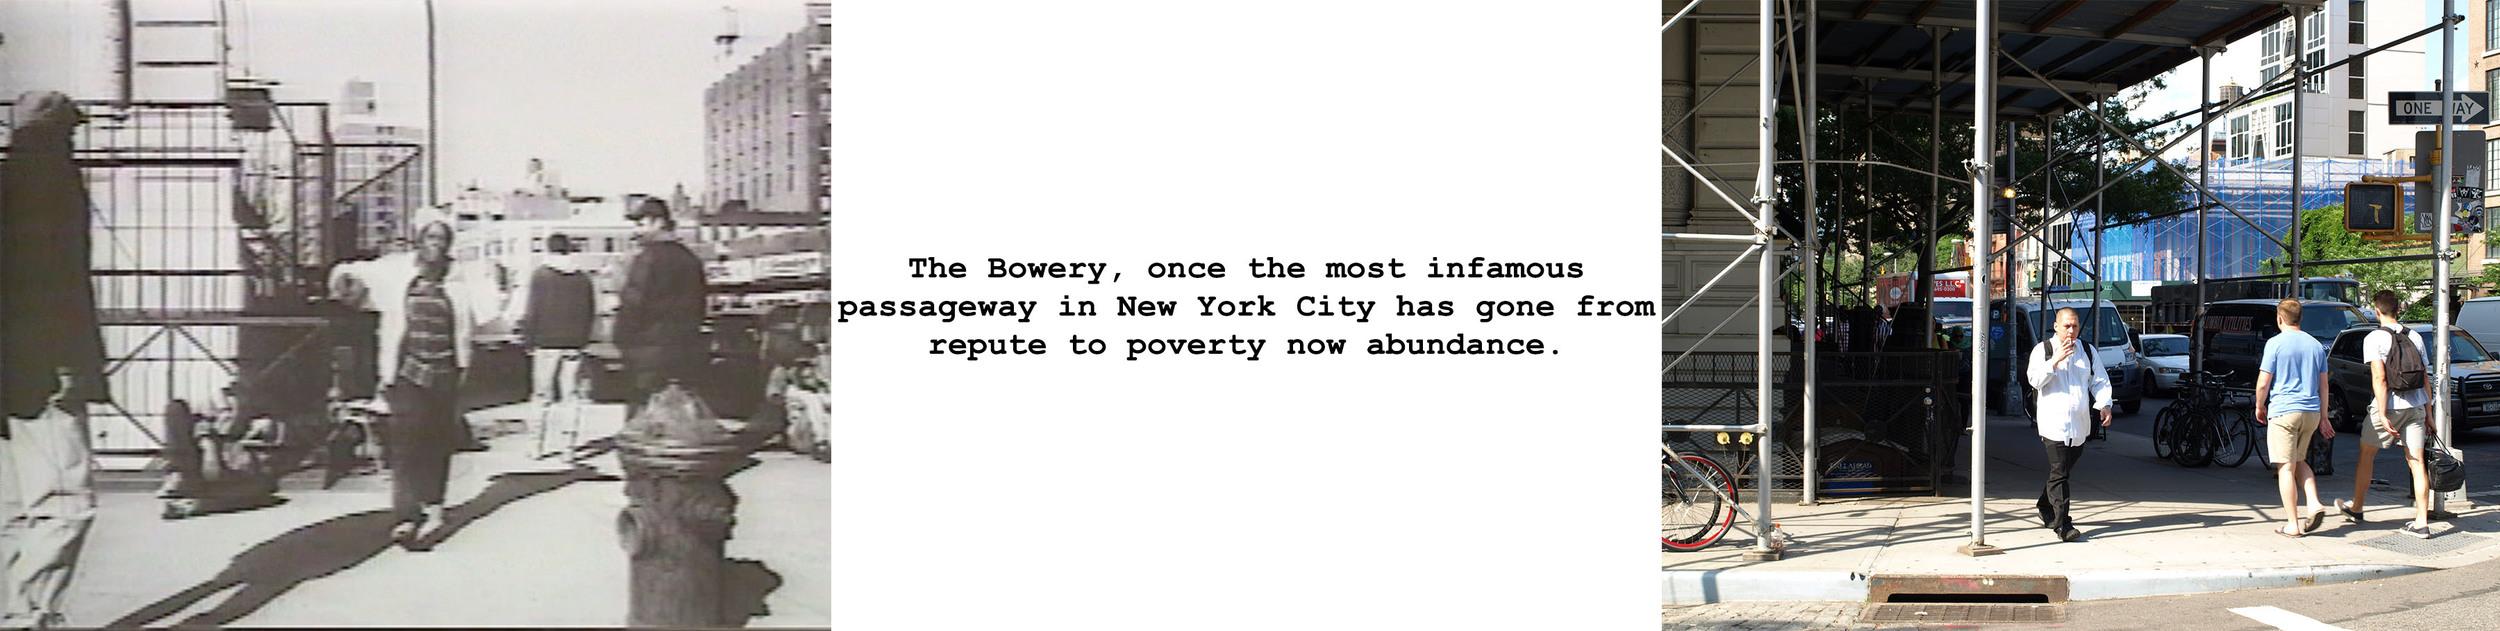 The Bowery.jpg